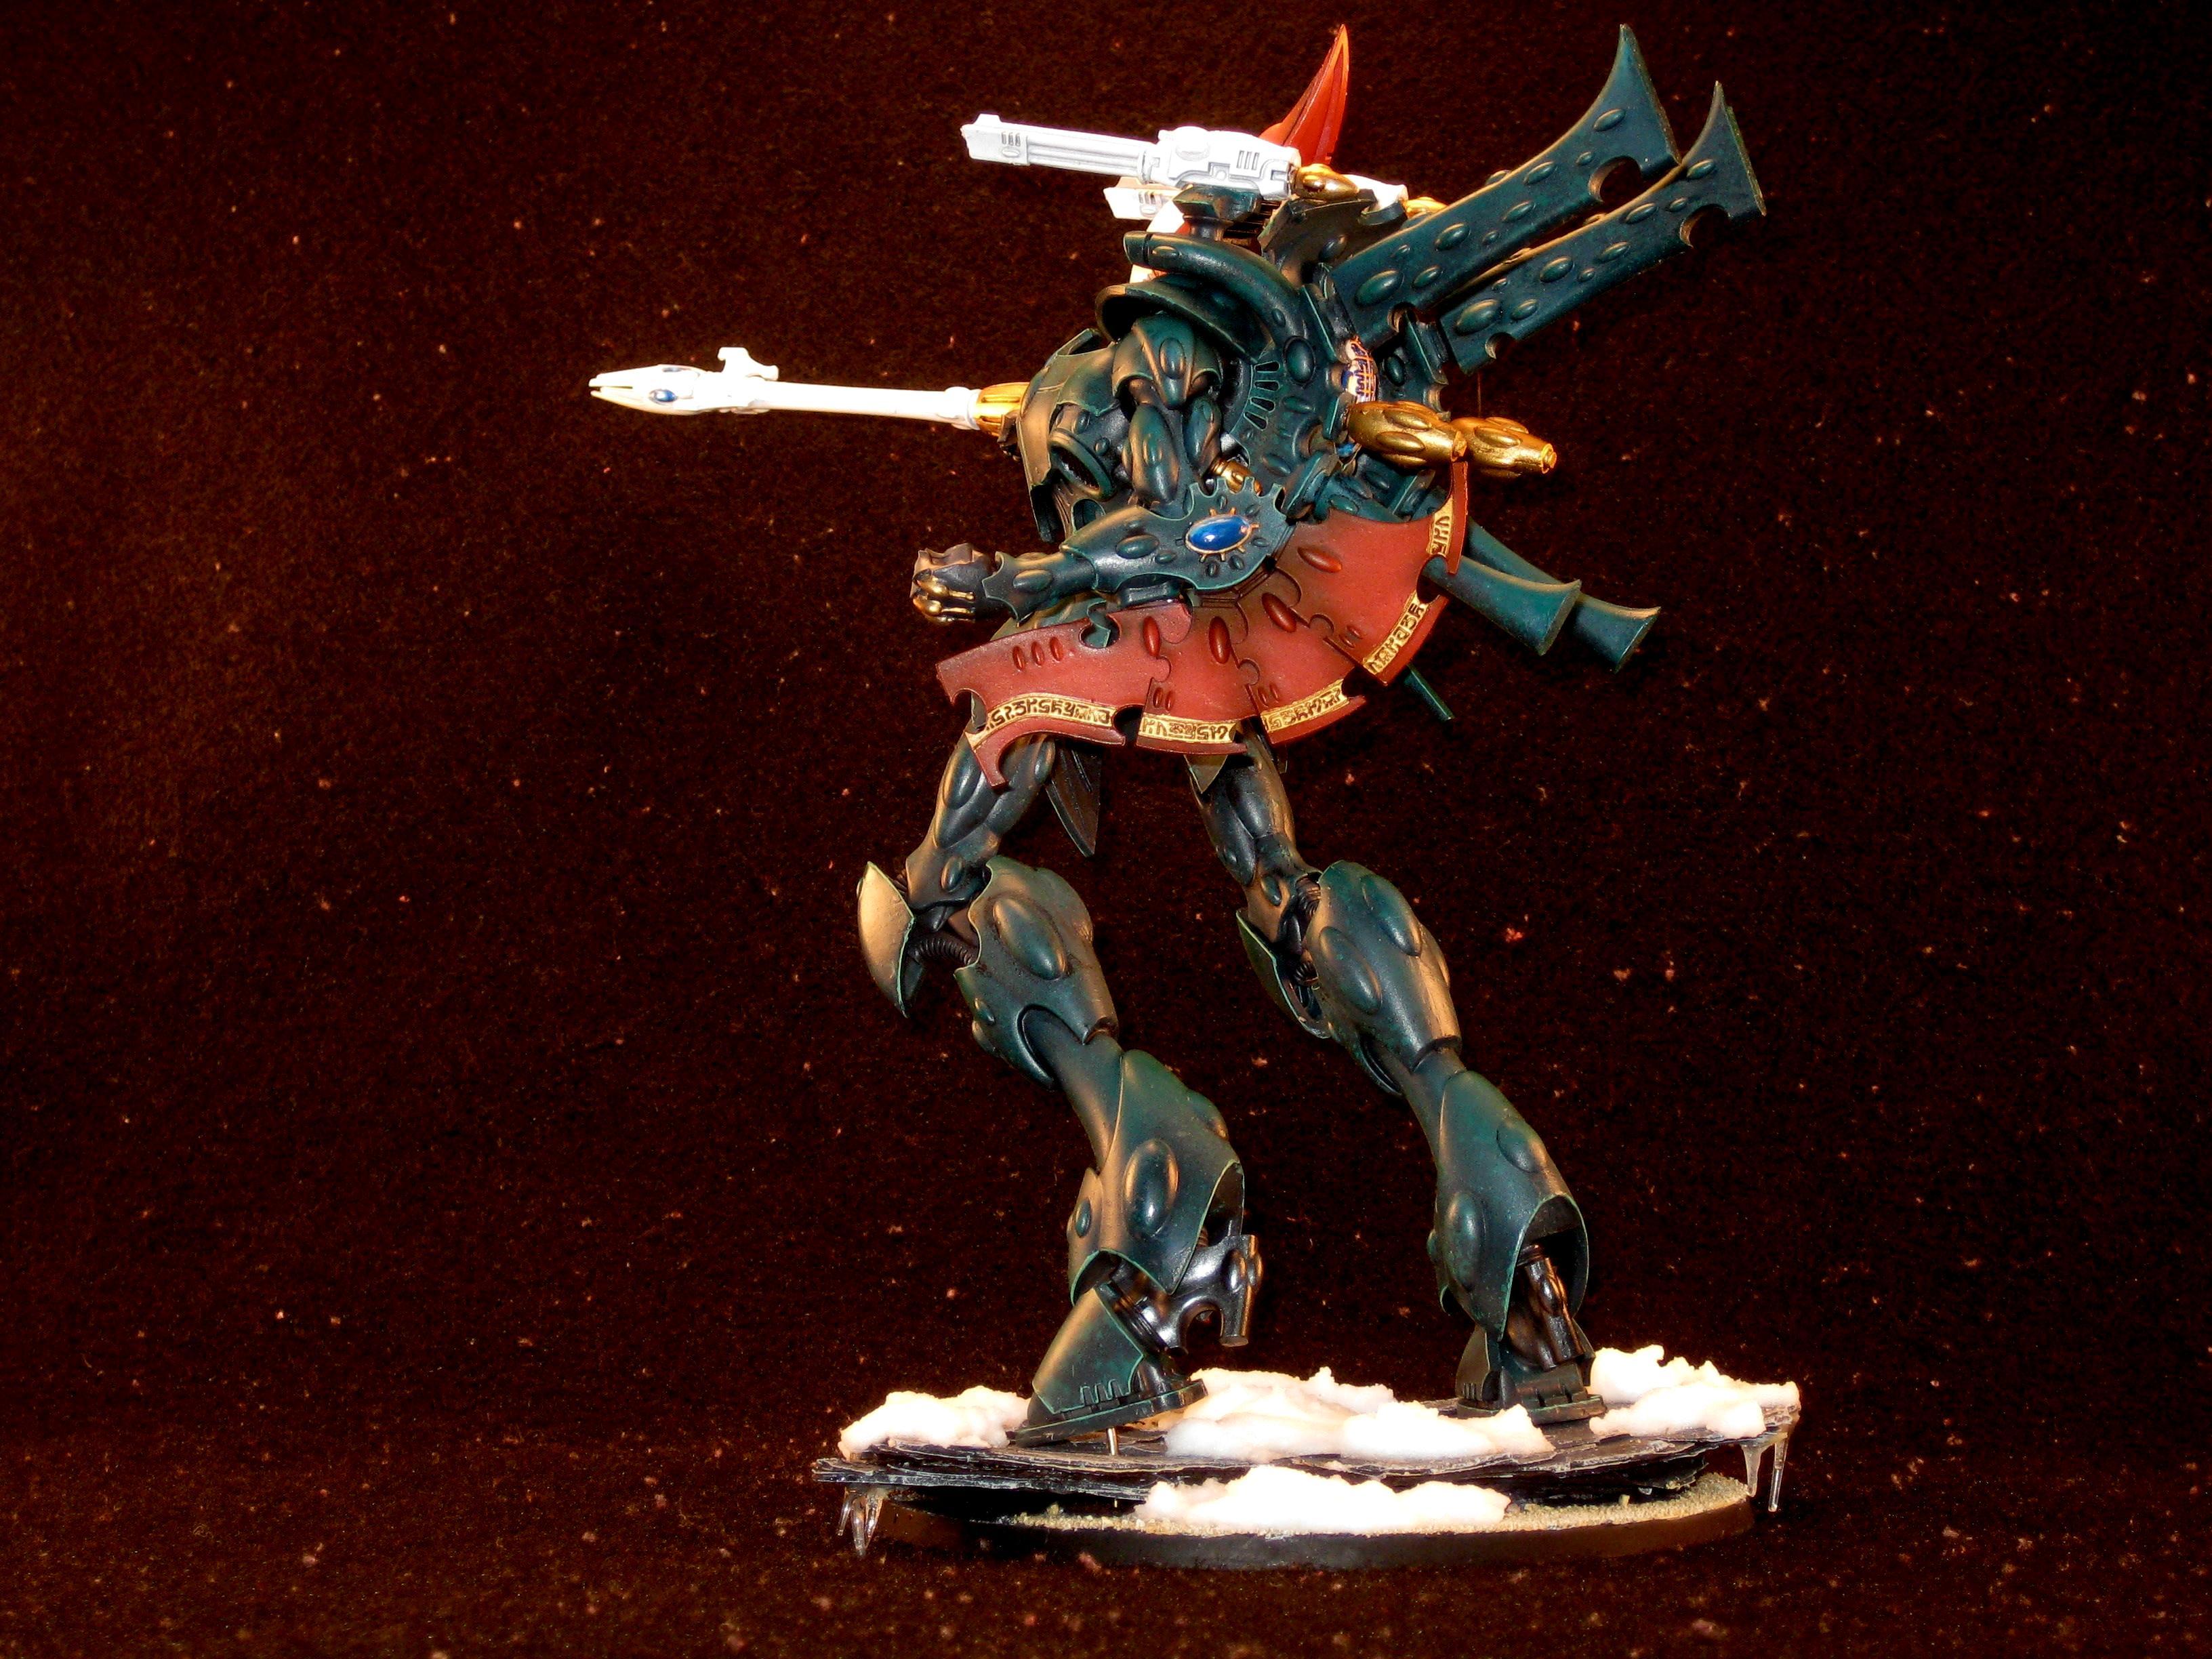 40k Commission Painting, Commission Painting, Dark Eldar, Eldar, Snow, Warhammer 40,000, Wraith Knight